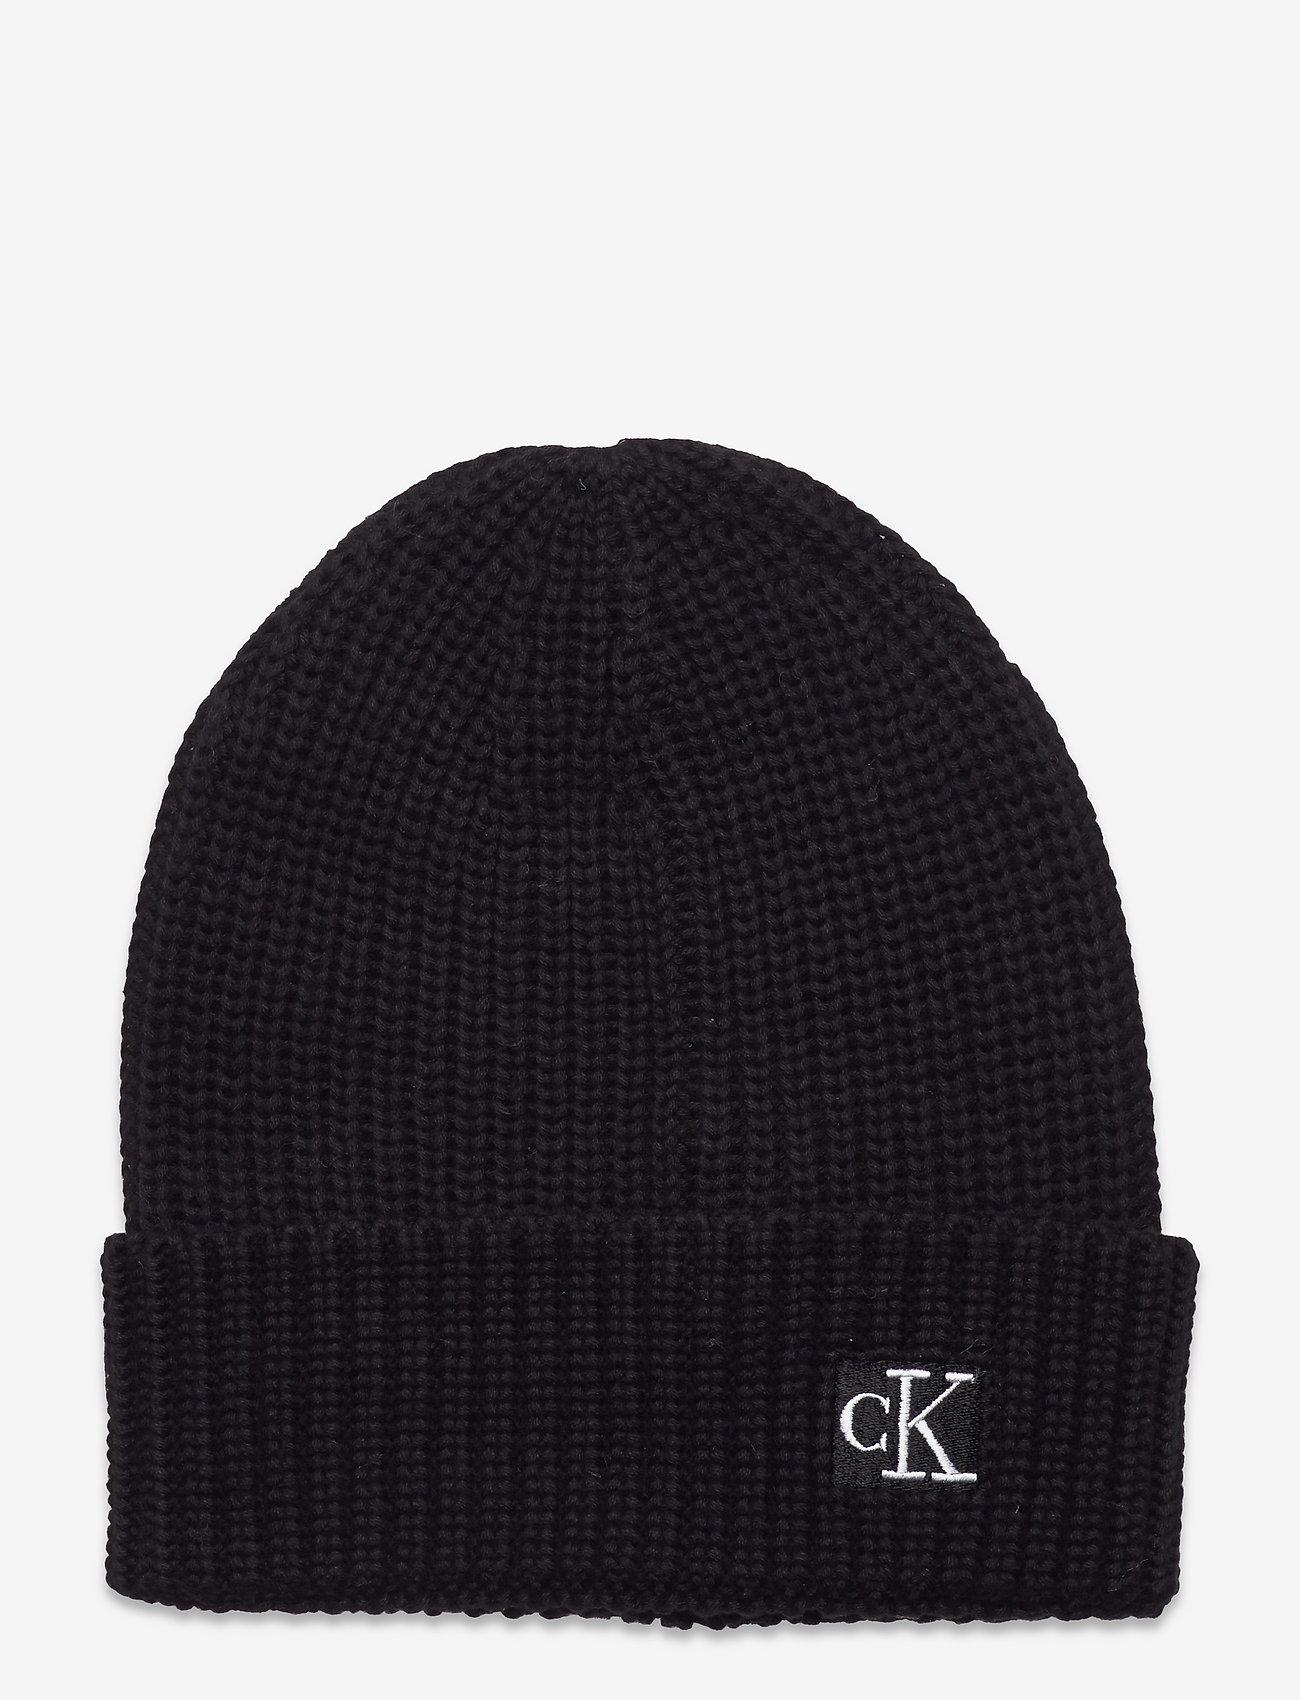 Calvin Klein - MODERN ESSENTIALS BEANIE - beanie - ck black - 0